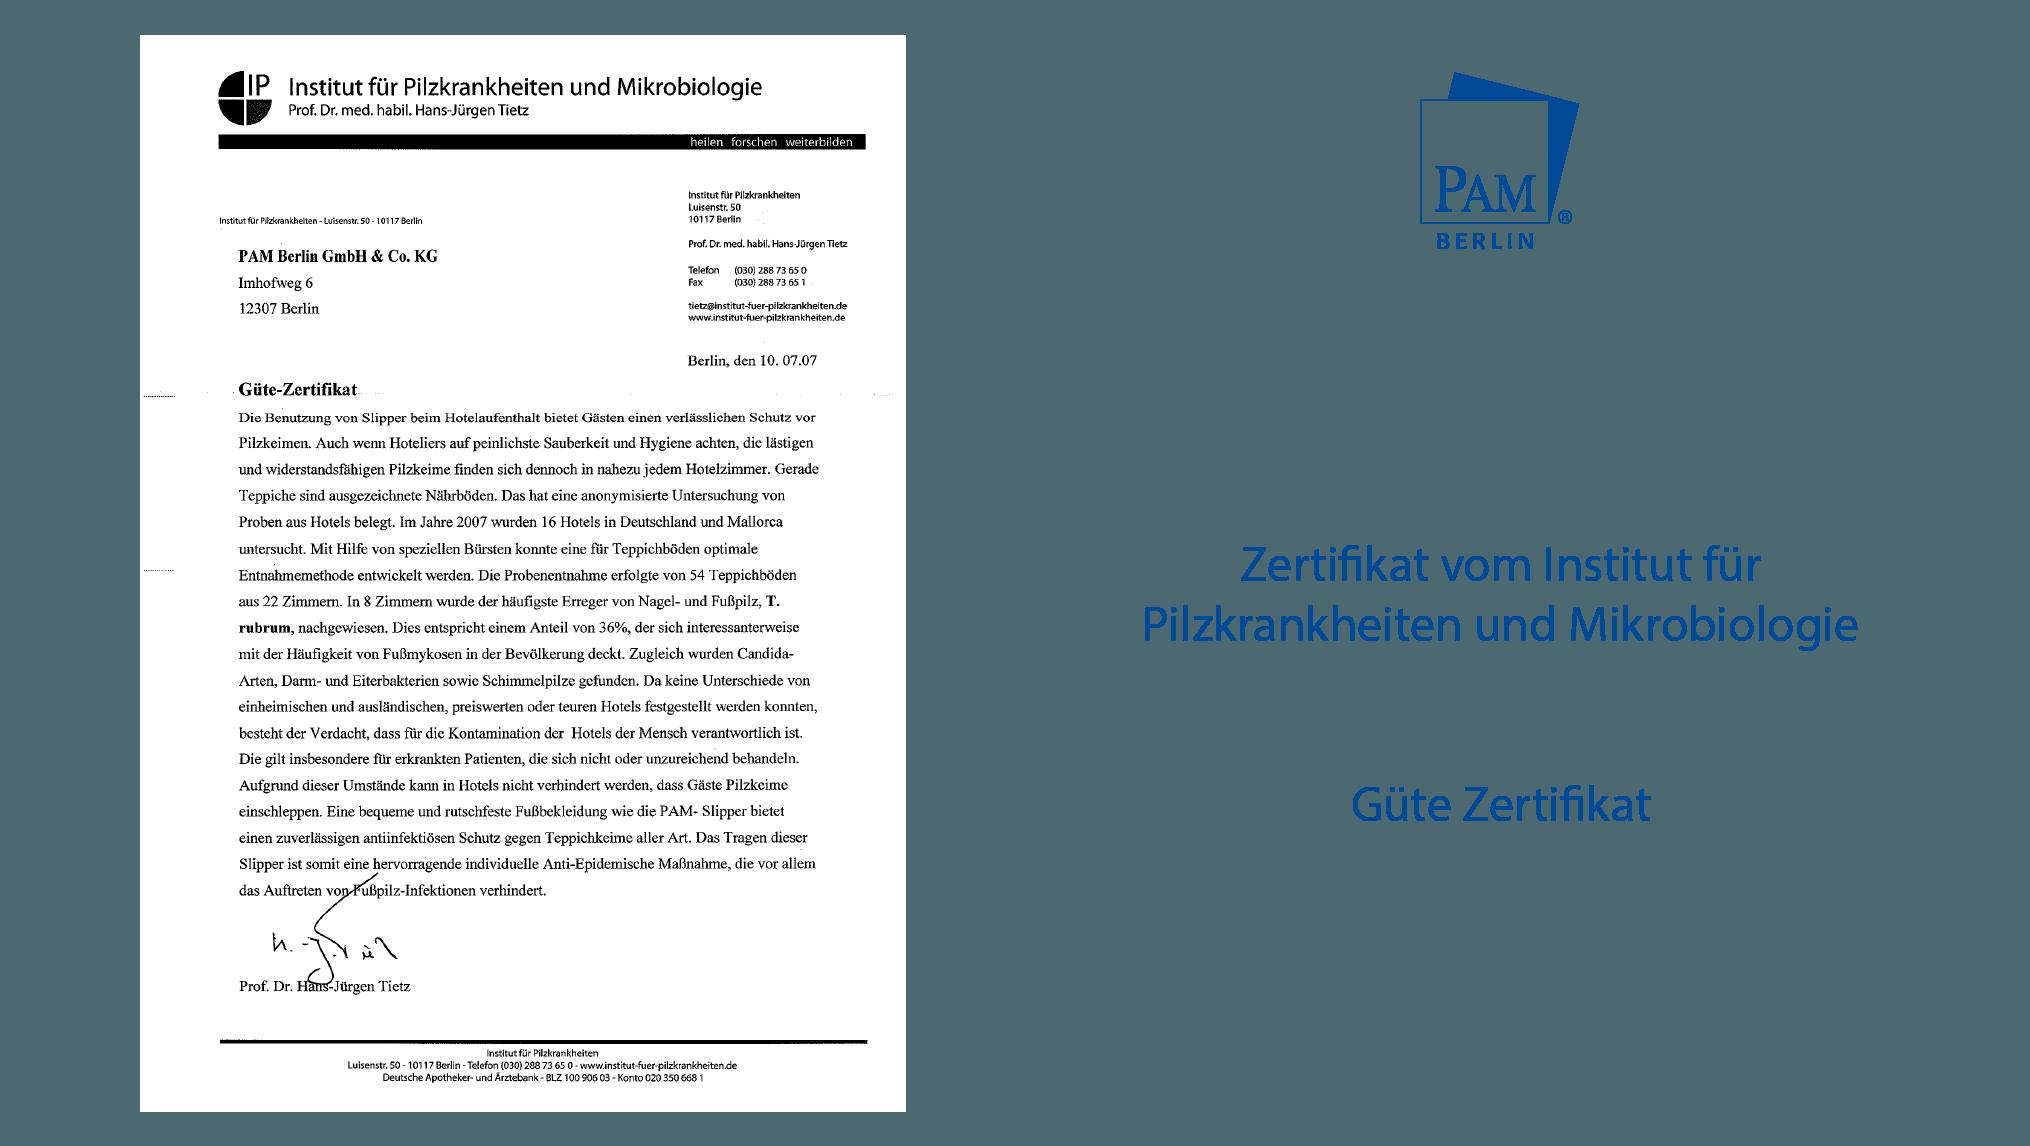 Güte Zertifikat